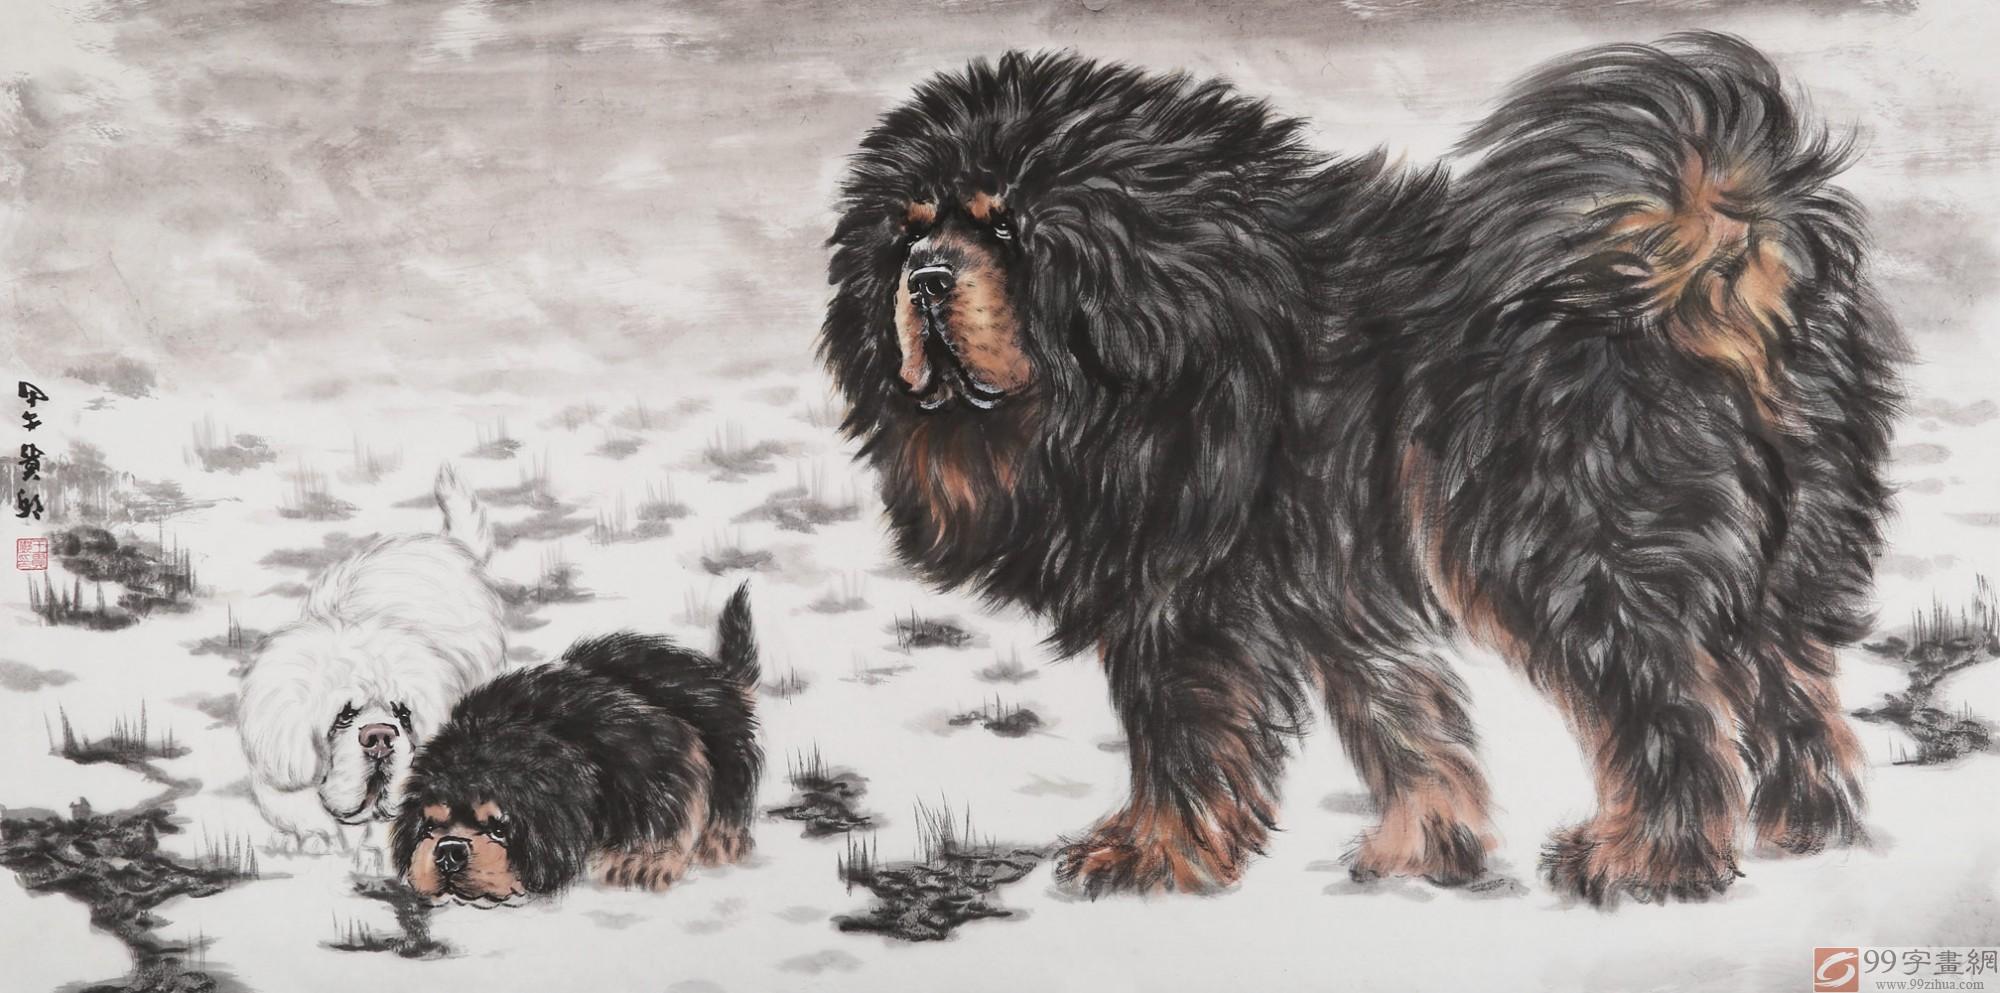 《守护》 - 动物画